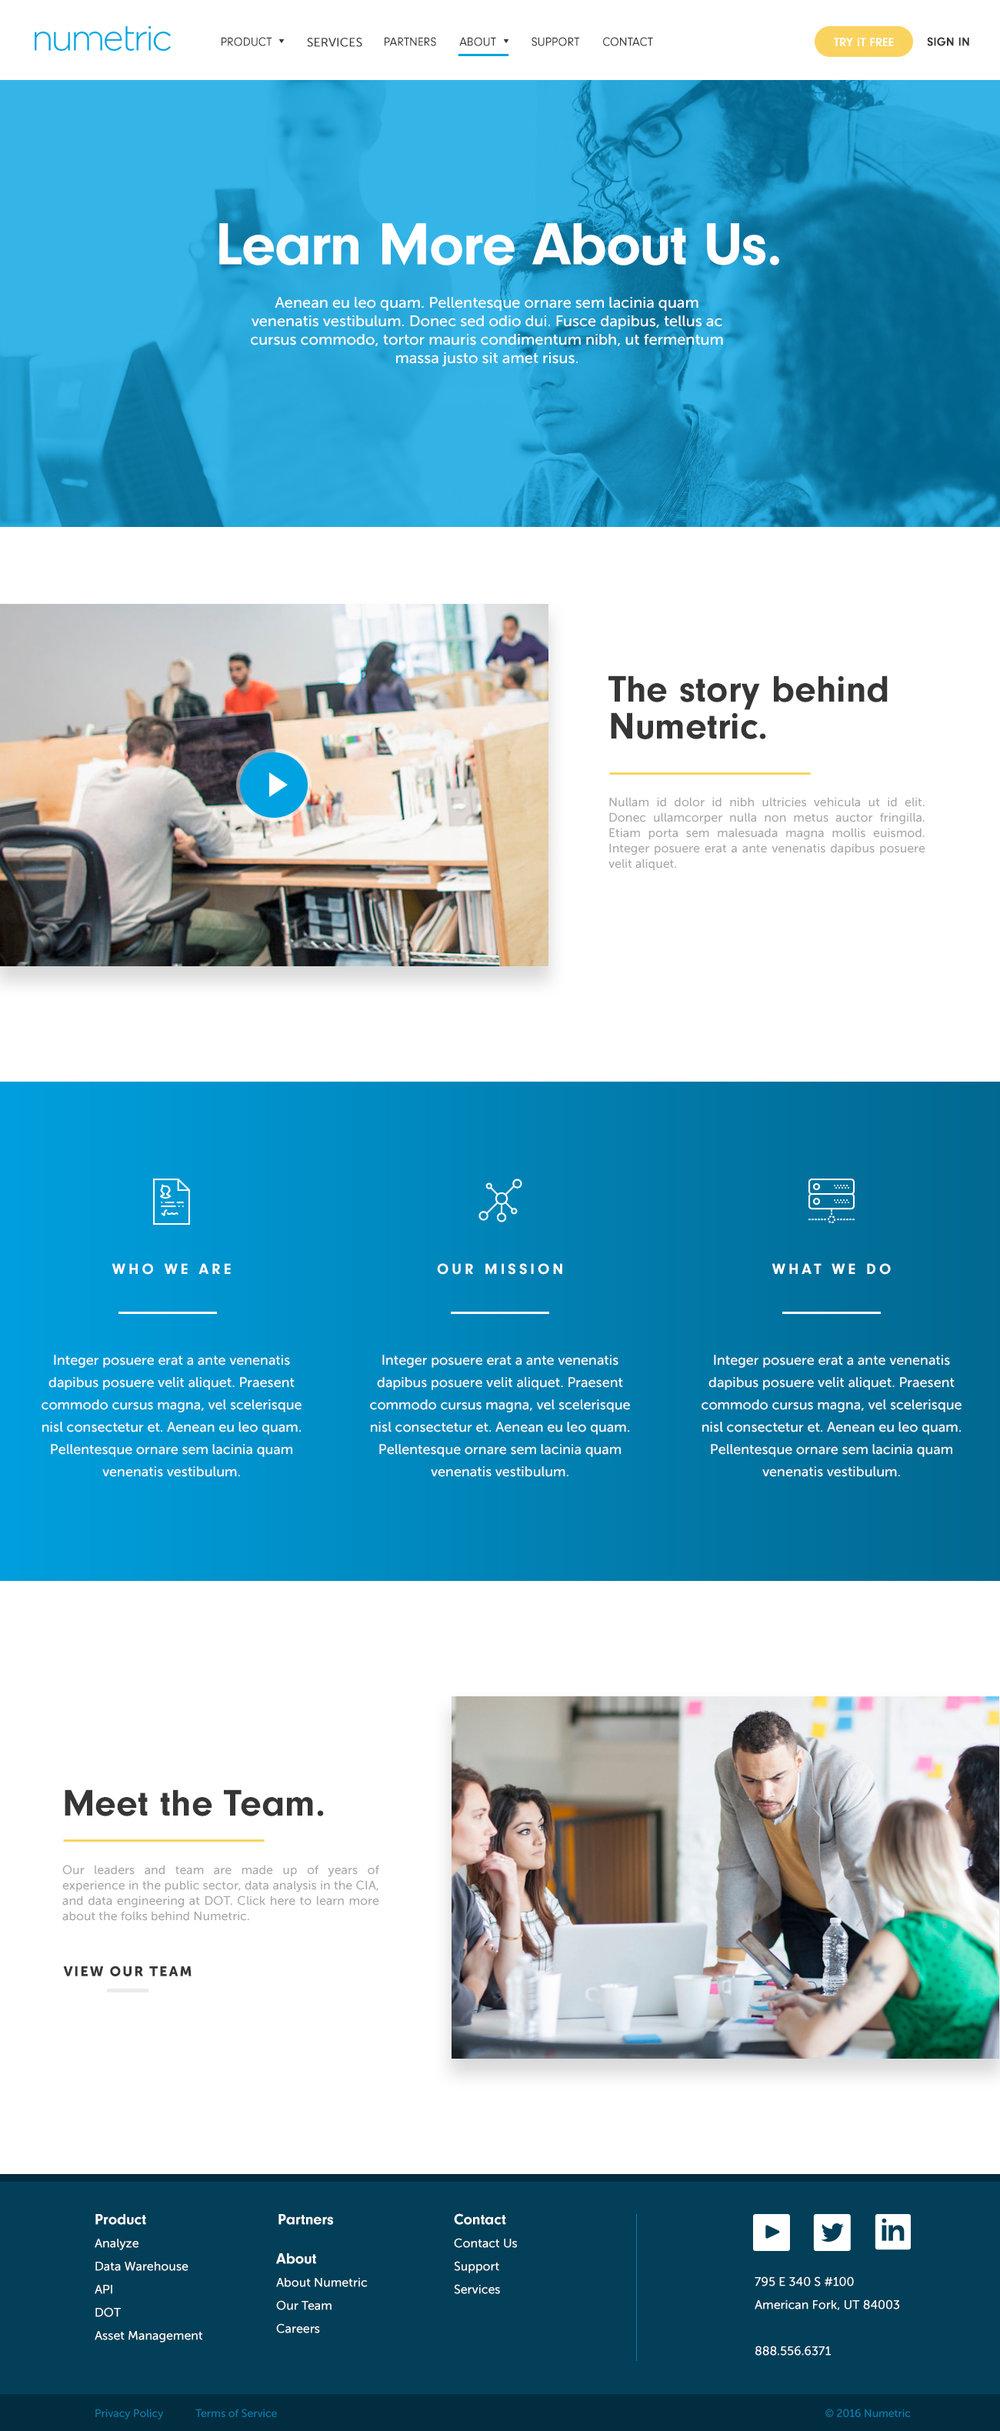 Numetric_Design_Page_6.jpg